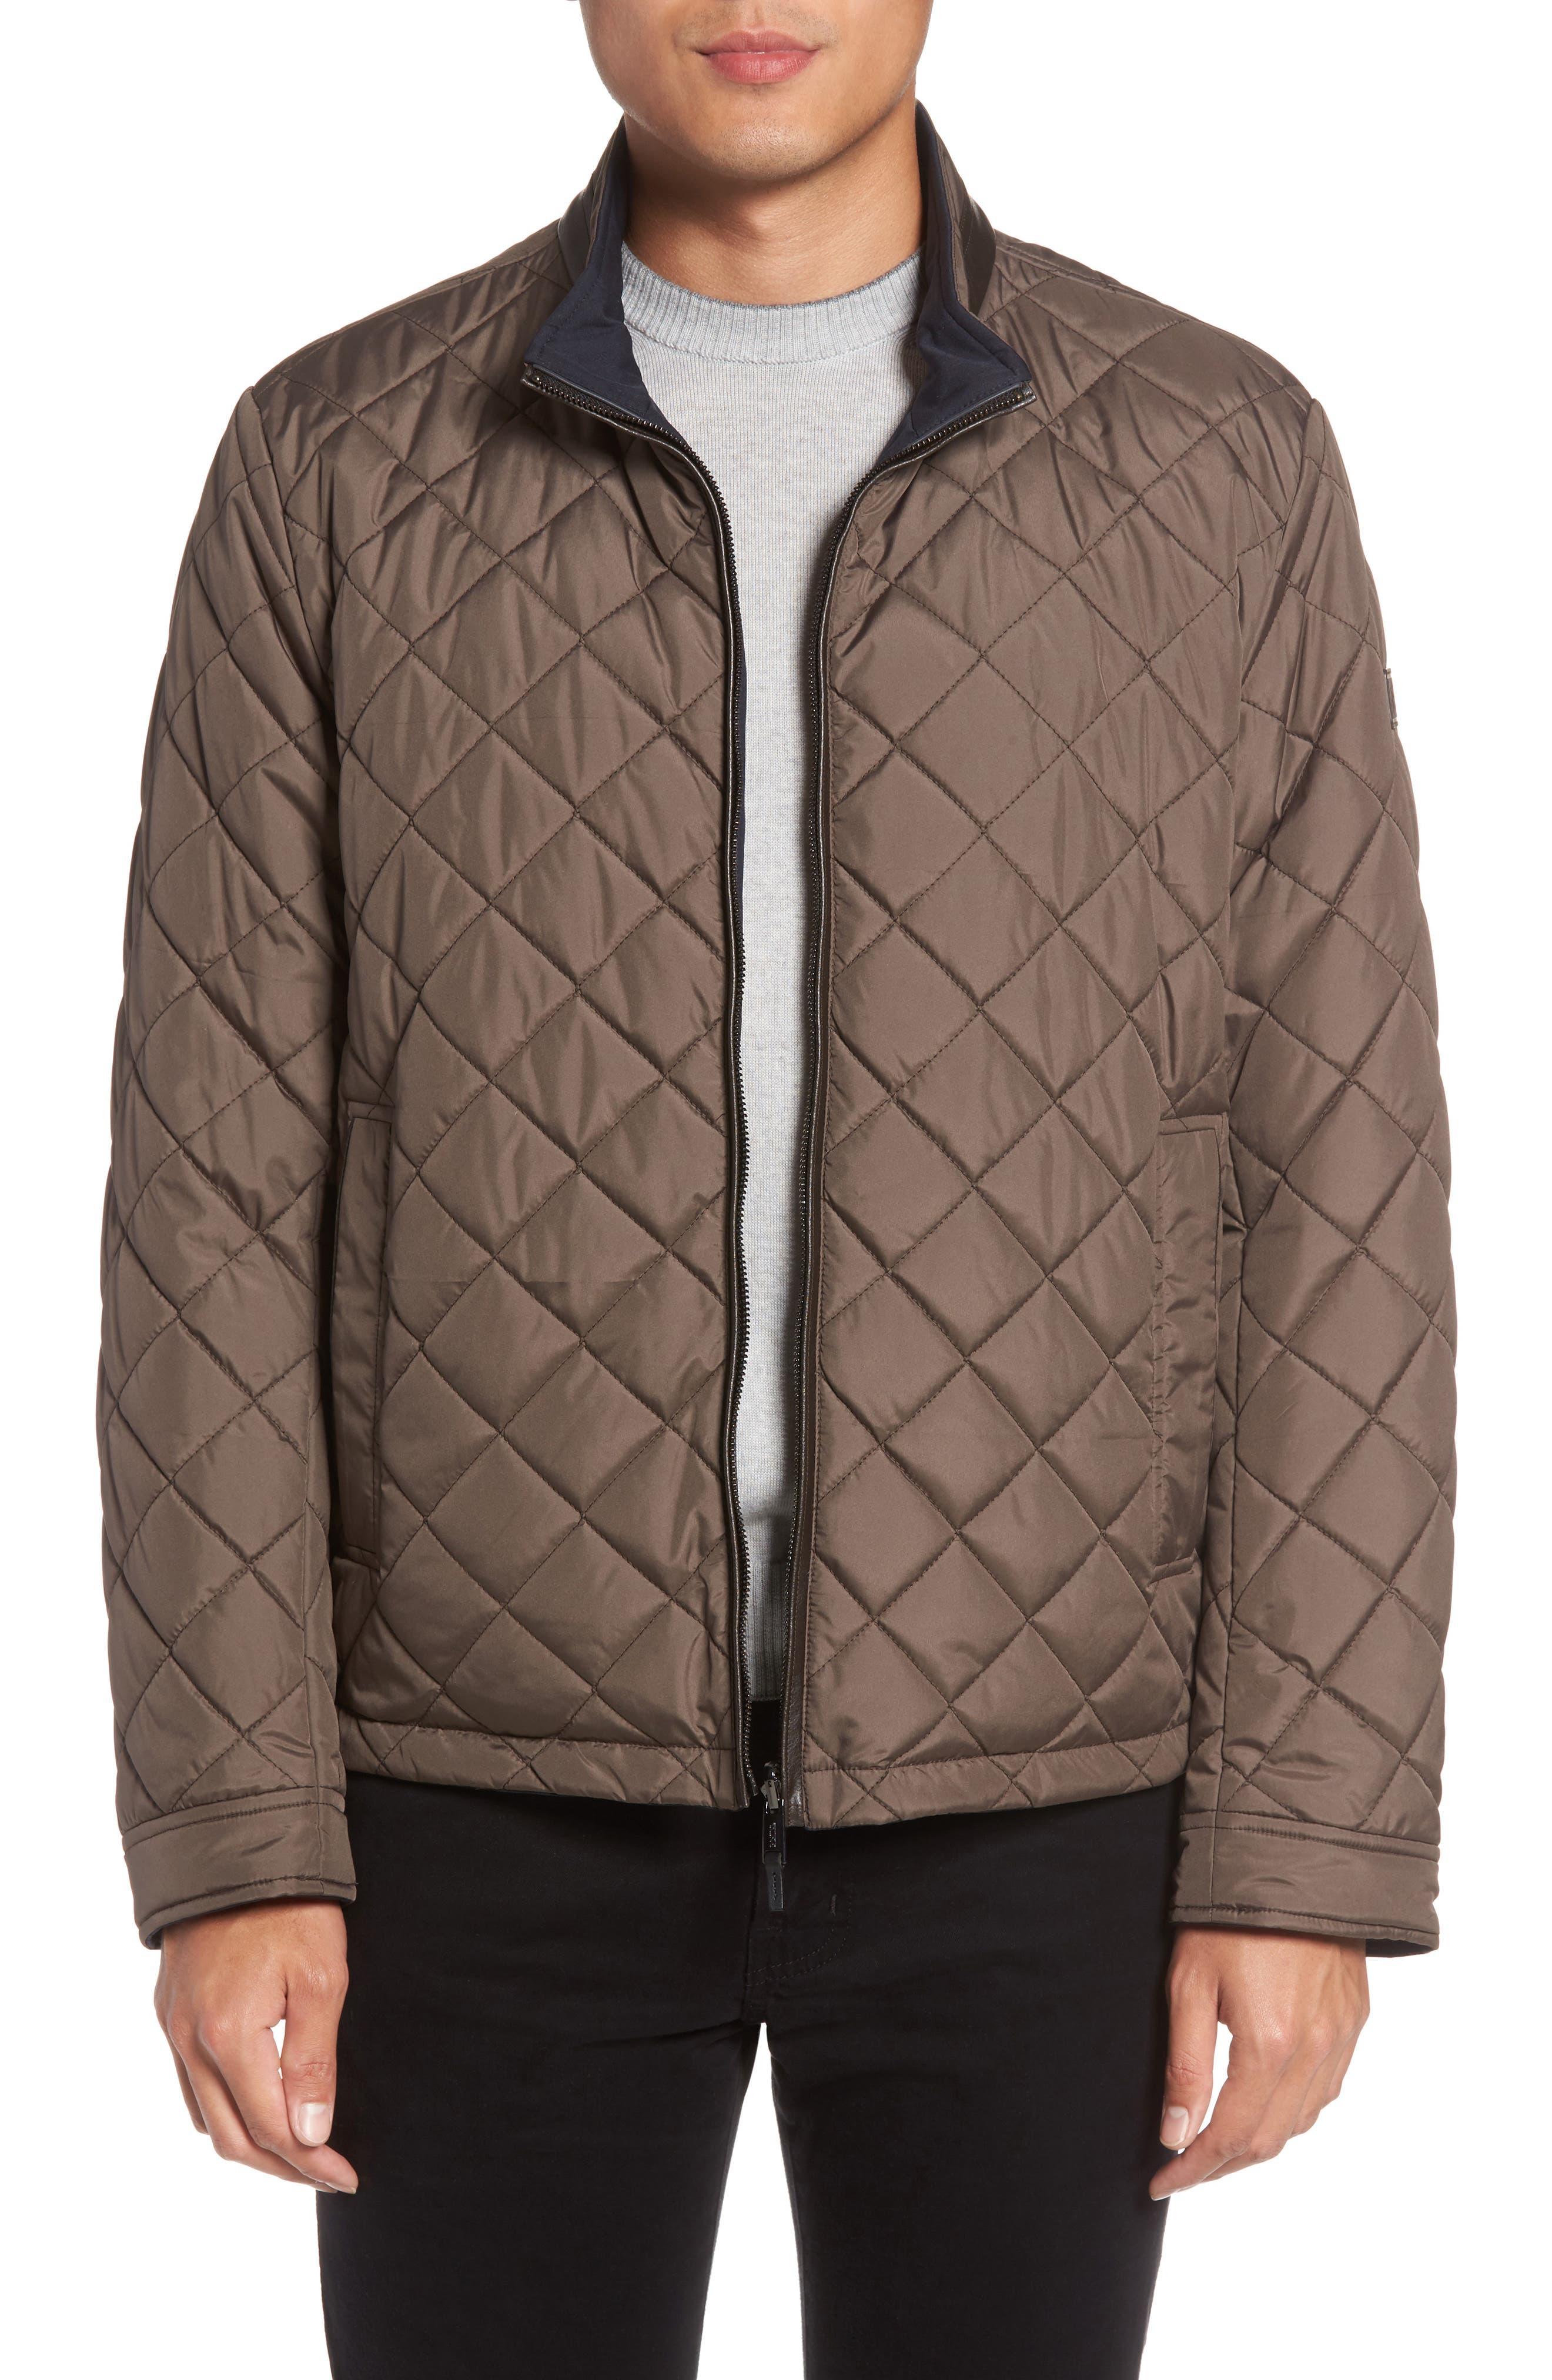 Tumi Reversible Jacket